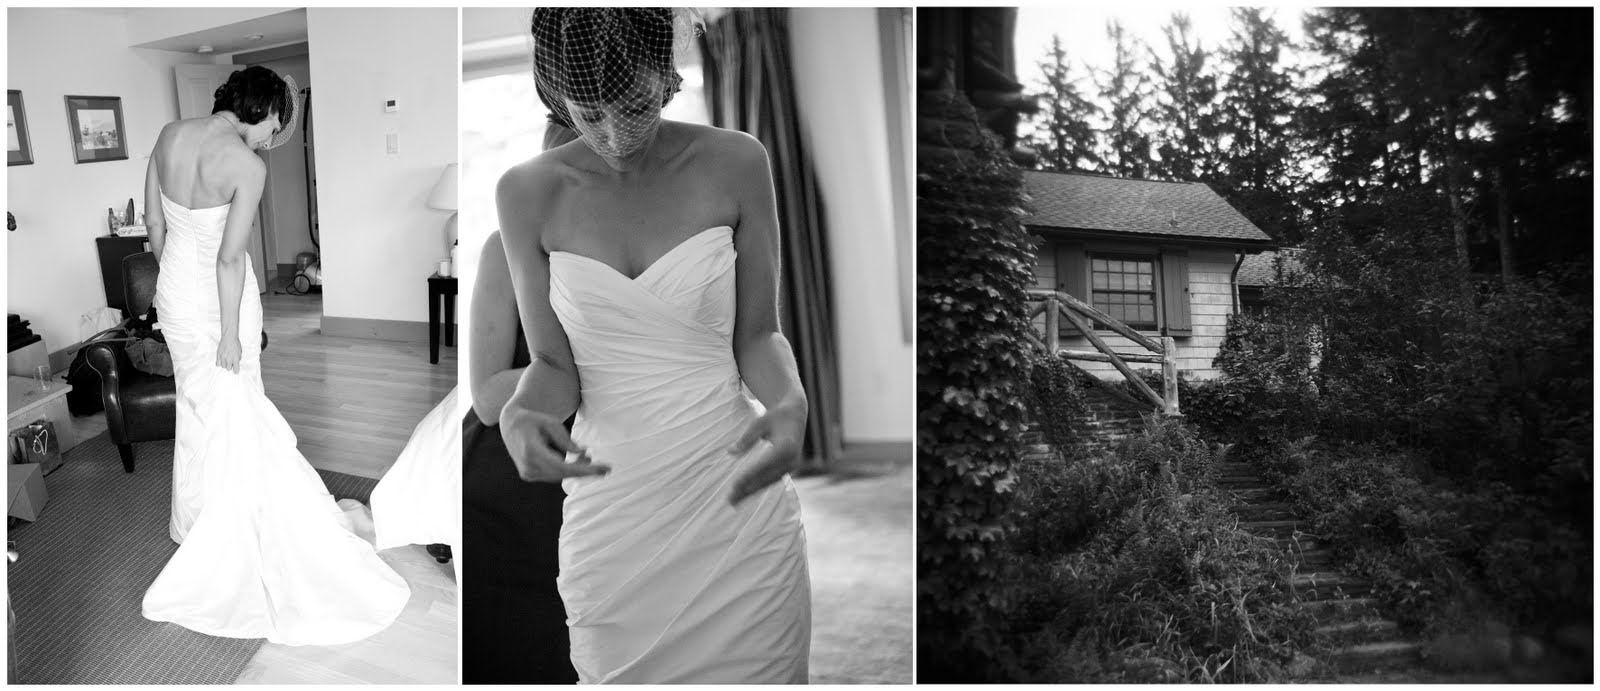 bw stairs bride 2.04.51 PM.jpg